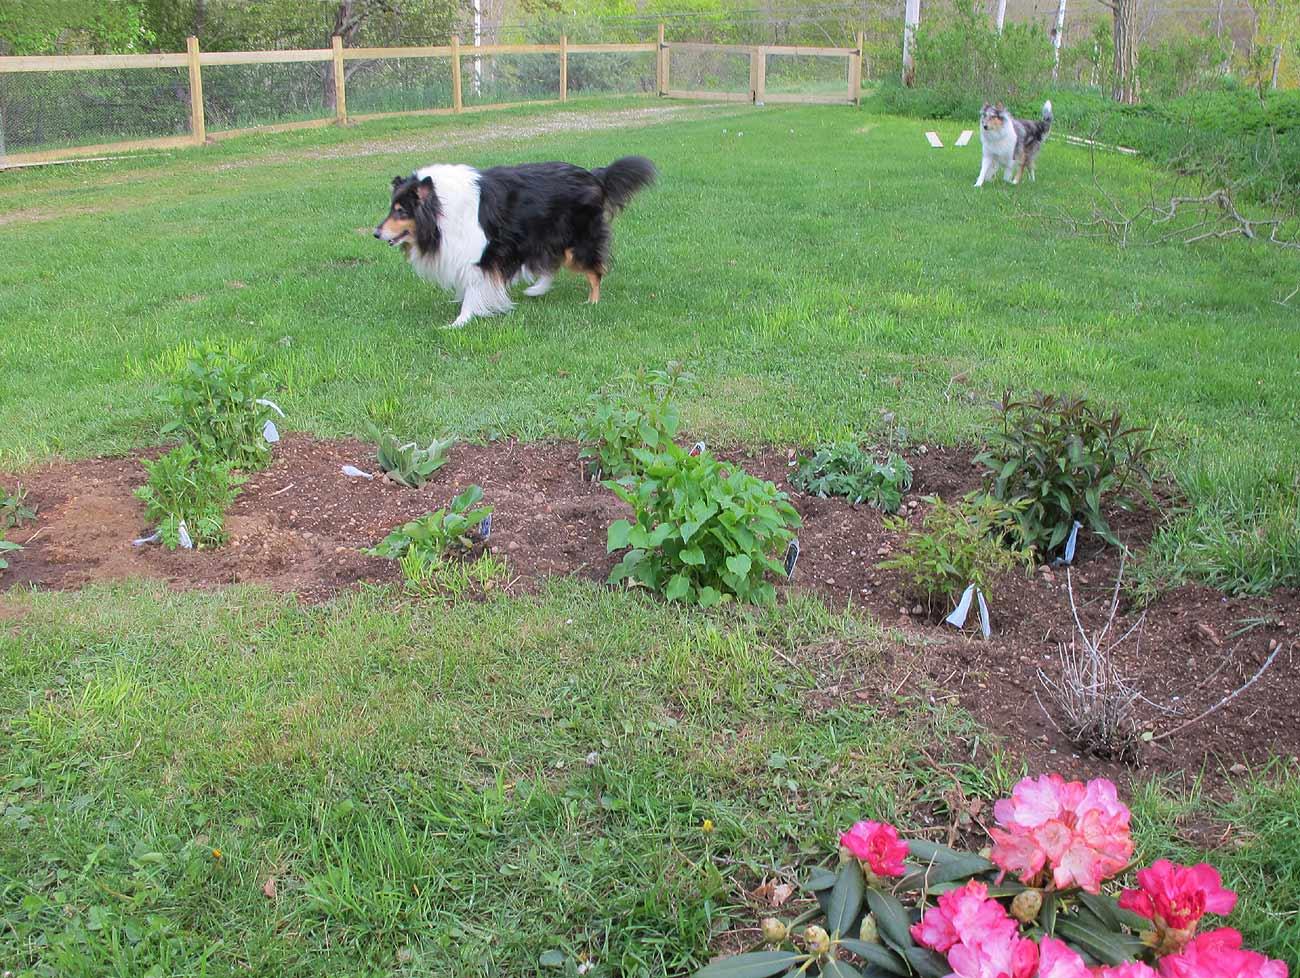 Dog Fence Yard How To Make Fence